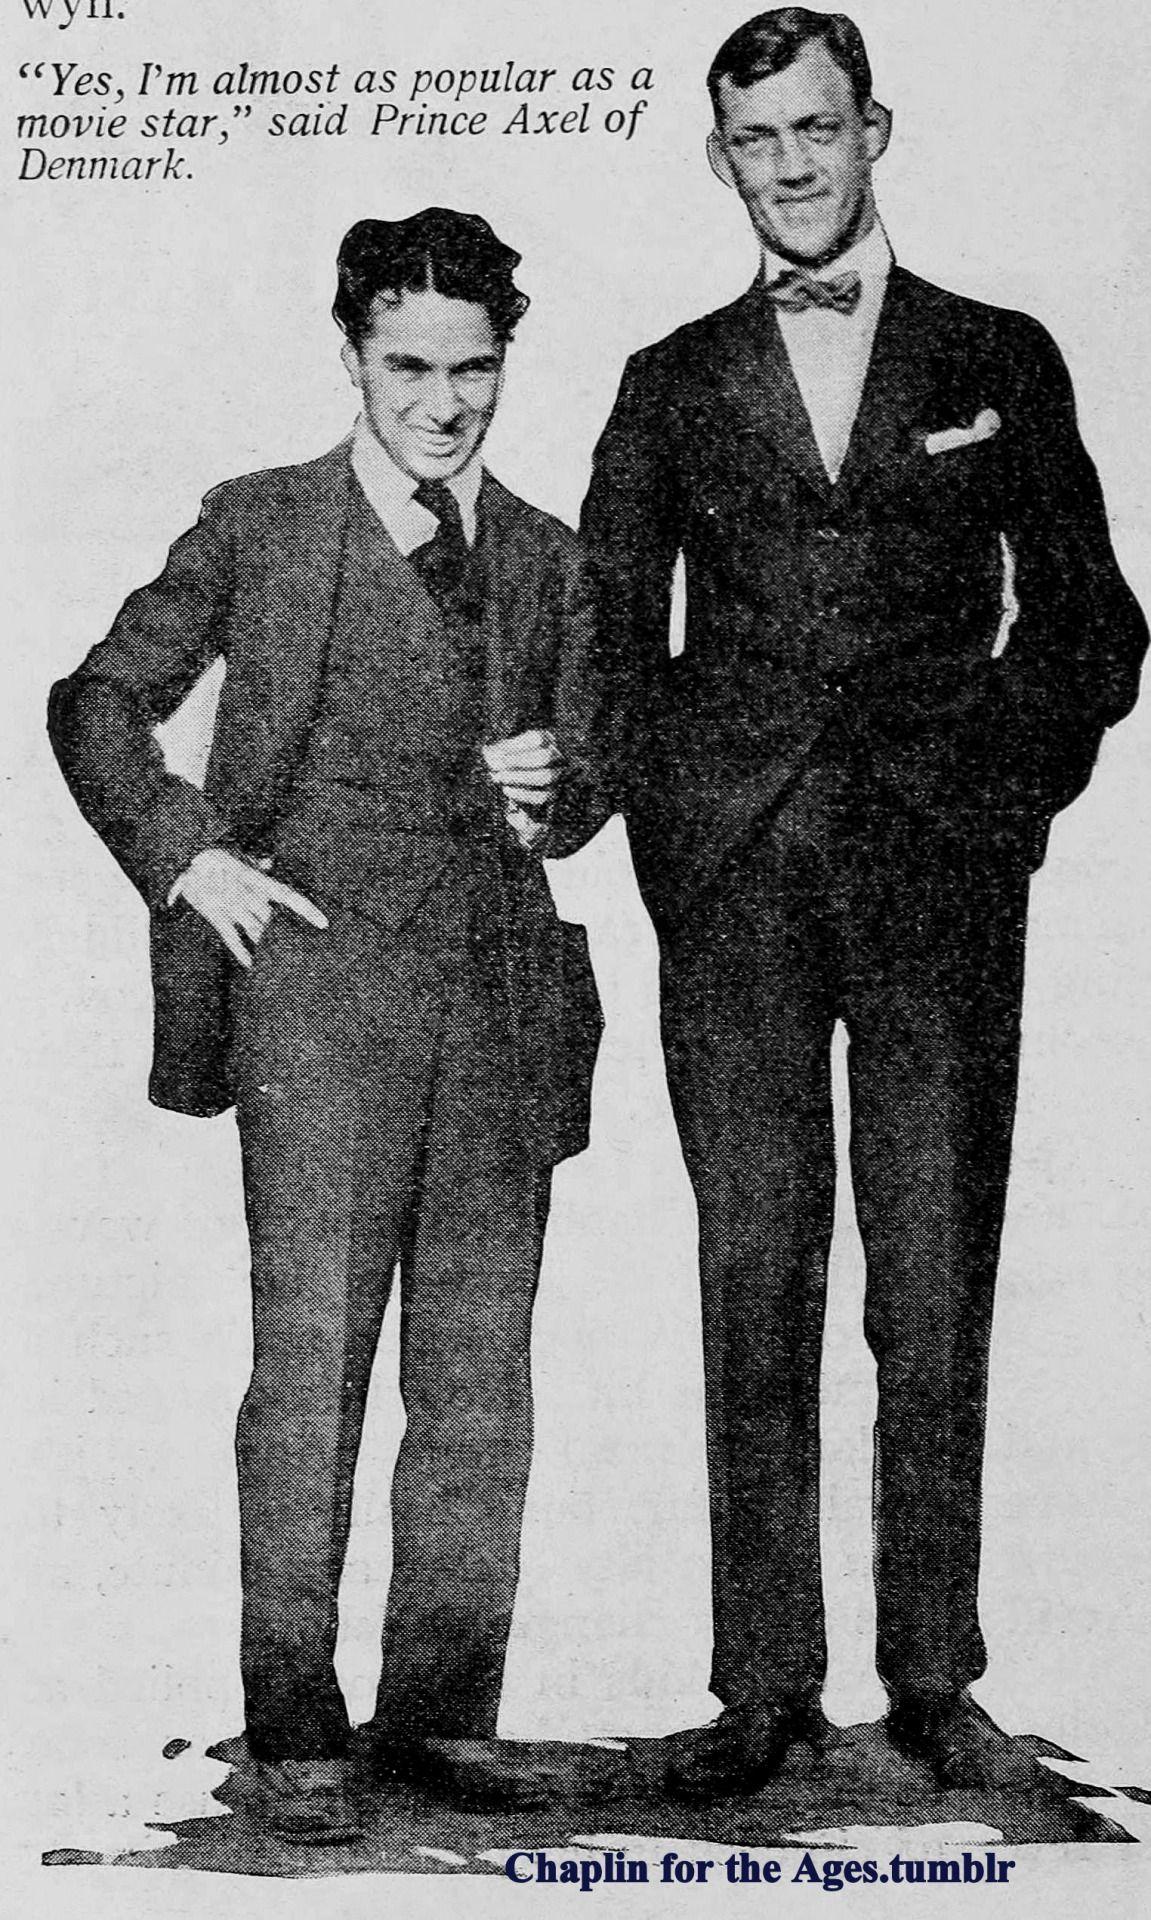 Charlie Chaplin And Prince Axel Of Denmark Prince Axel Had